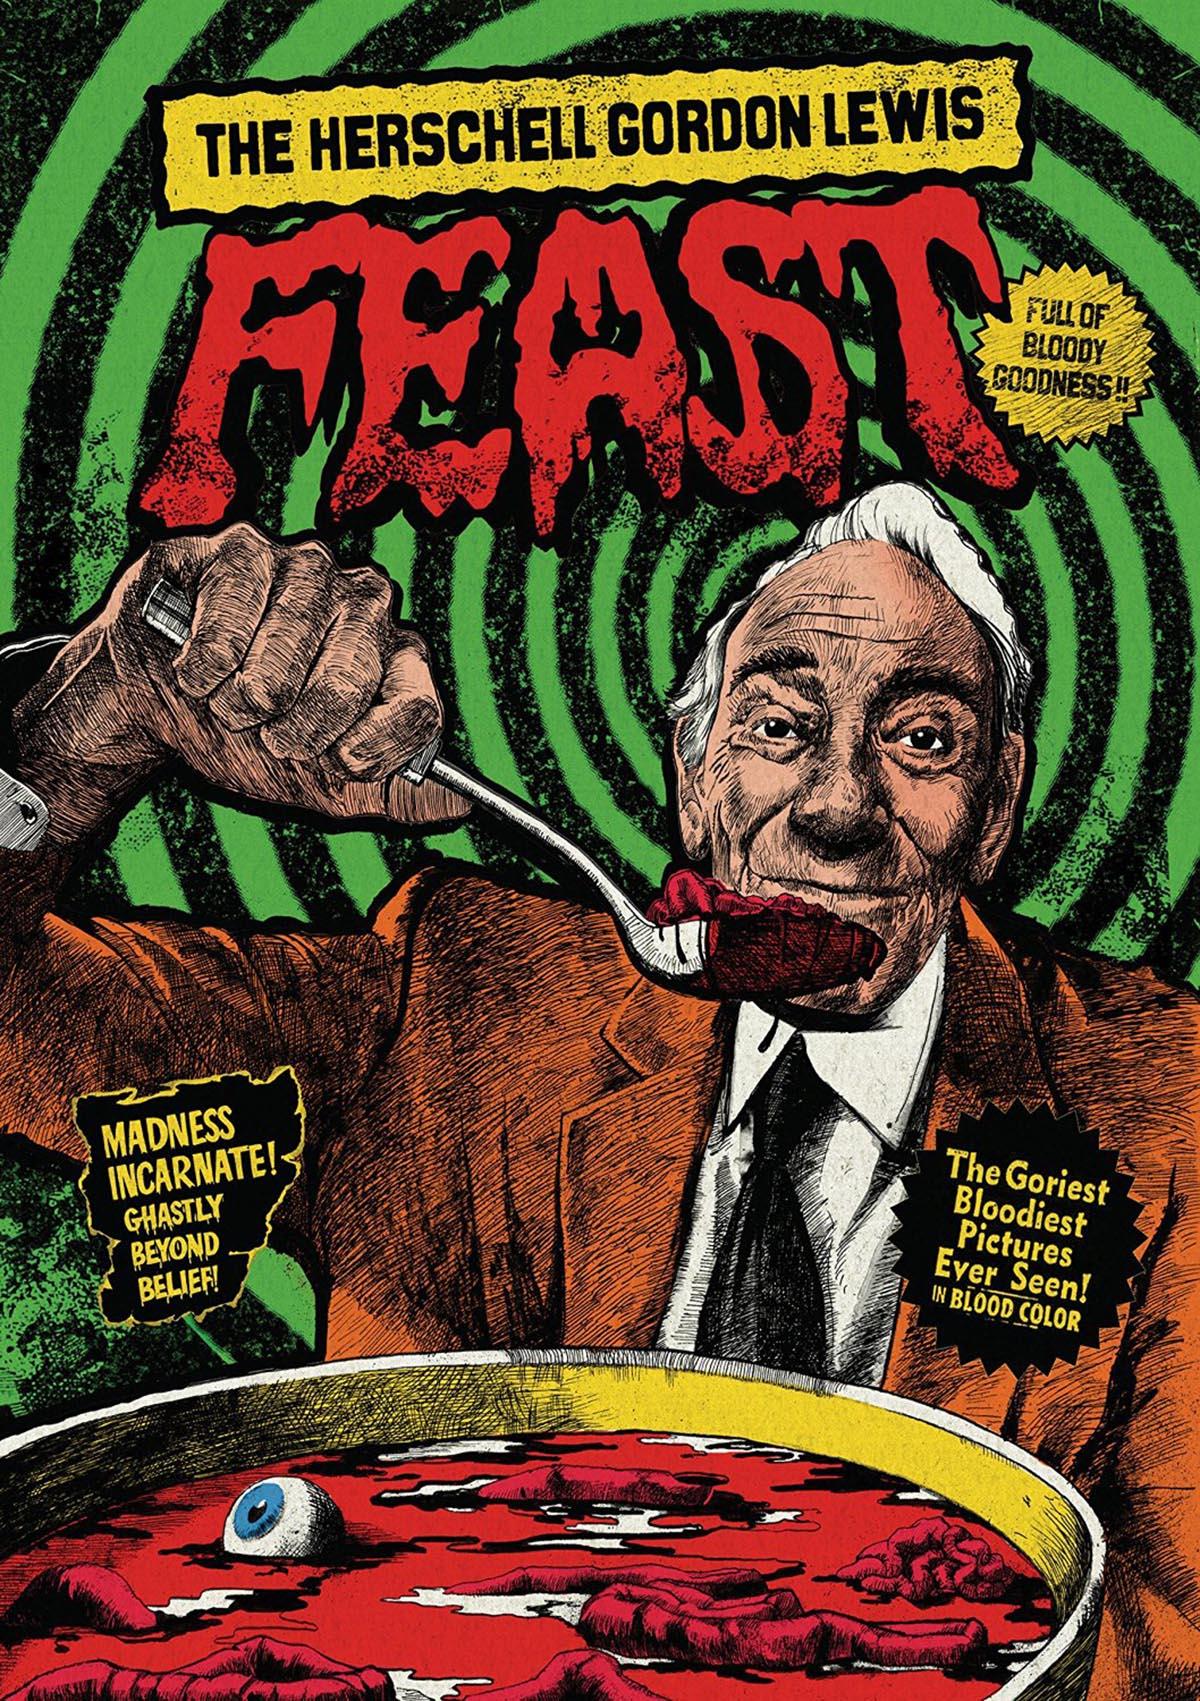 0e0a2dd87efc9 Blu-ray Review  The Herschell Gordon Lewis Feast - Slant Magazine